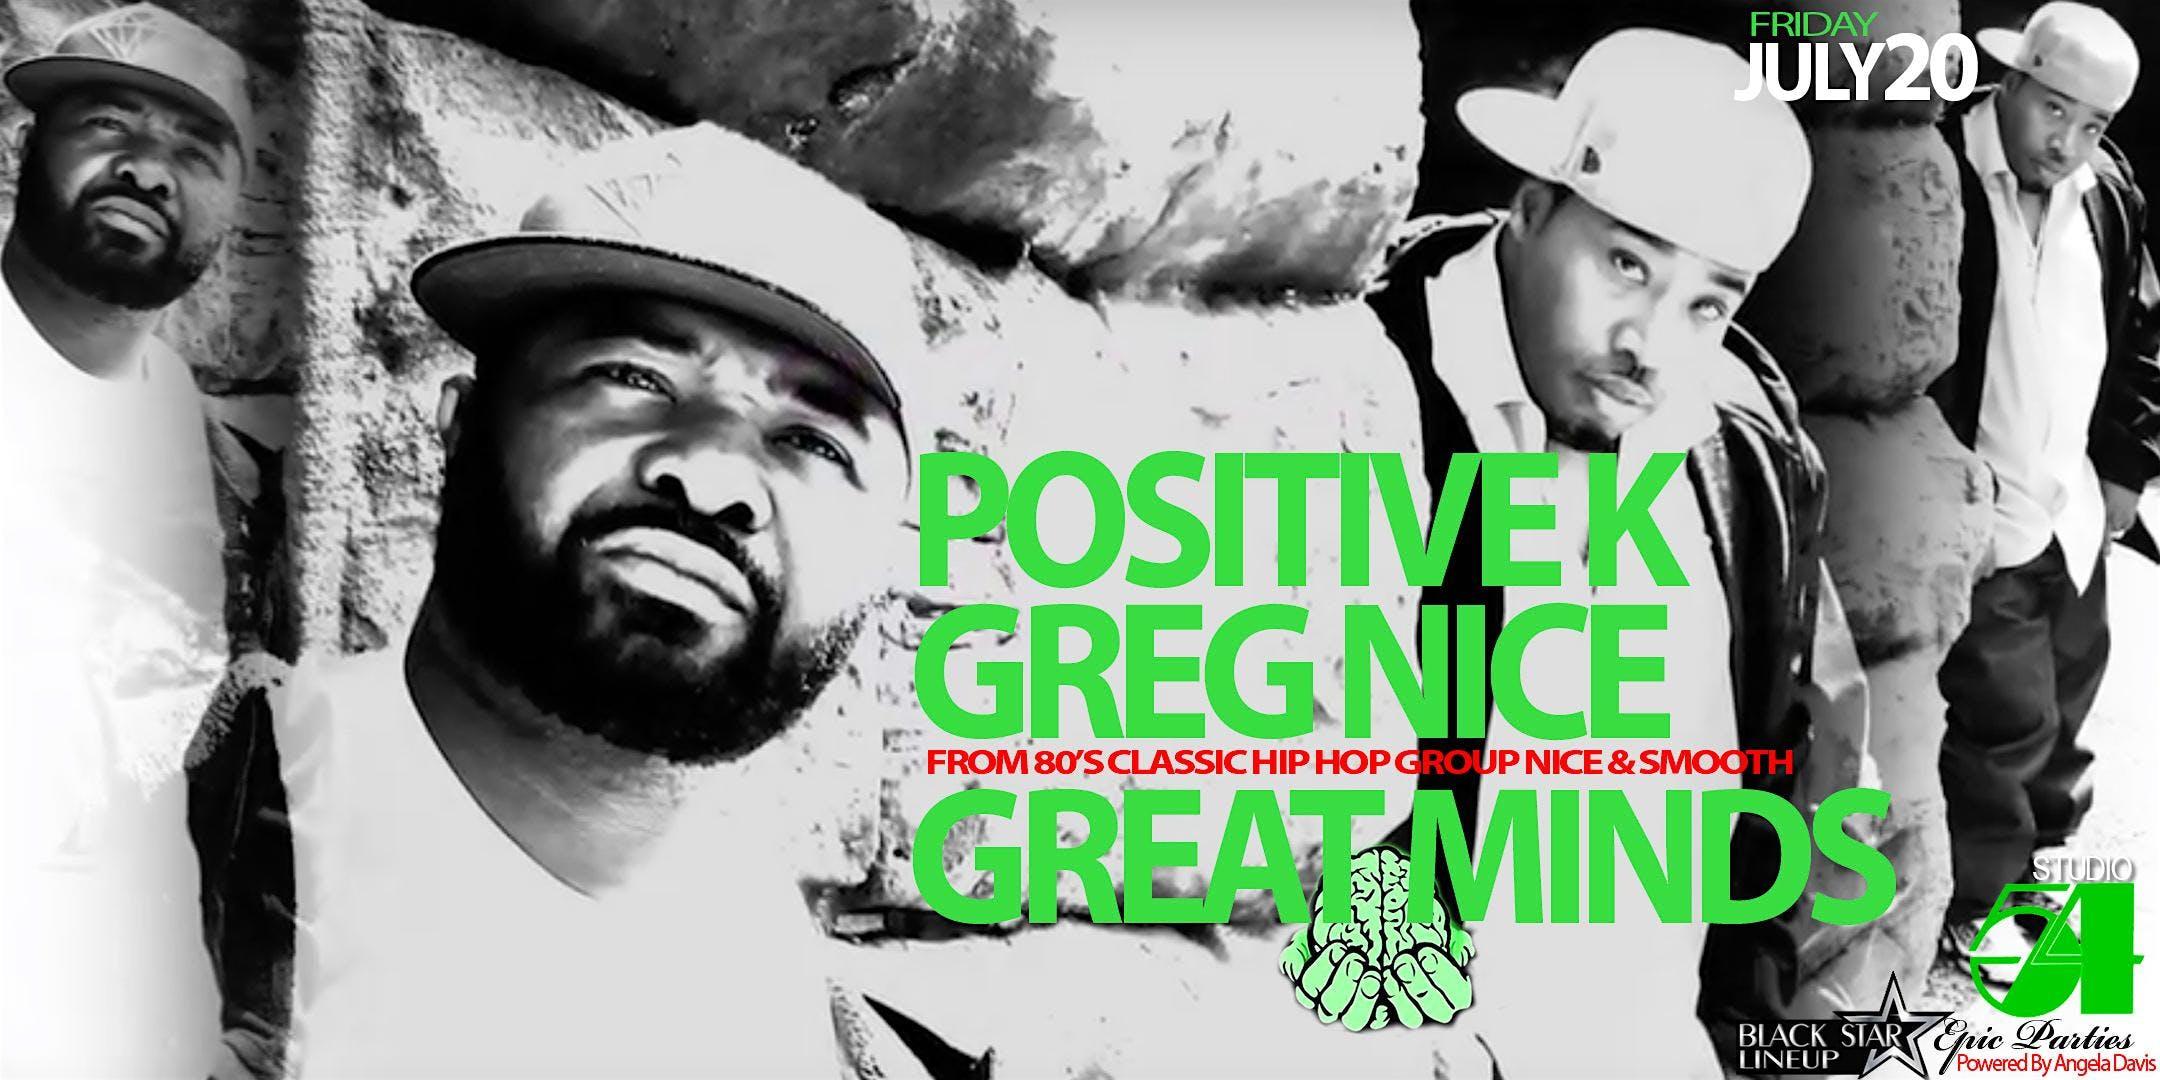 Positive K Greg Nice (Let's Take it Back to t